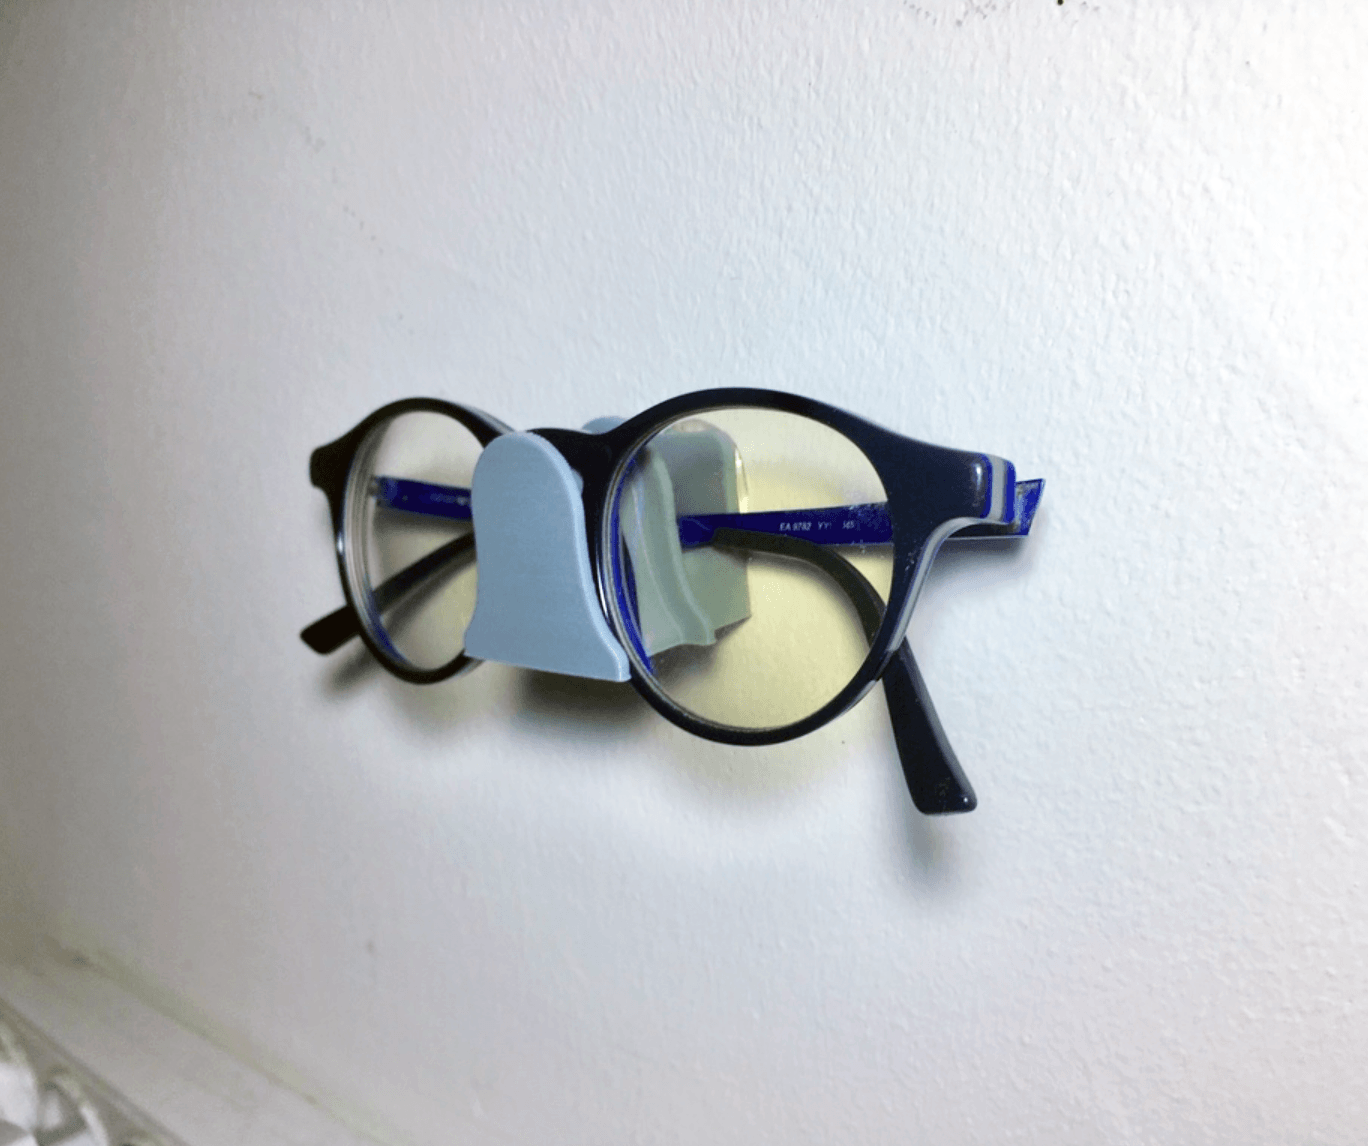 Capture d'écran 2018-03-30 à 15.55.20.png Download free STL file Eyeglasses wall mount holder • Template to 3D print, rubenzilzer